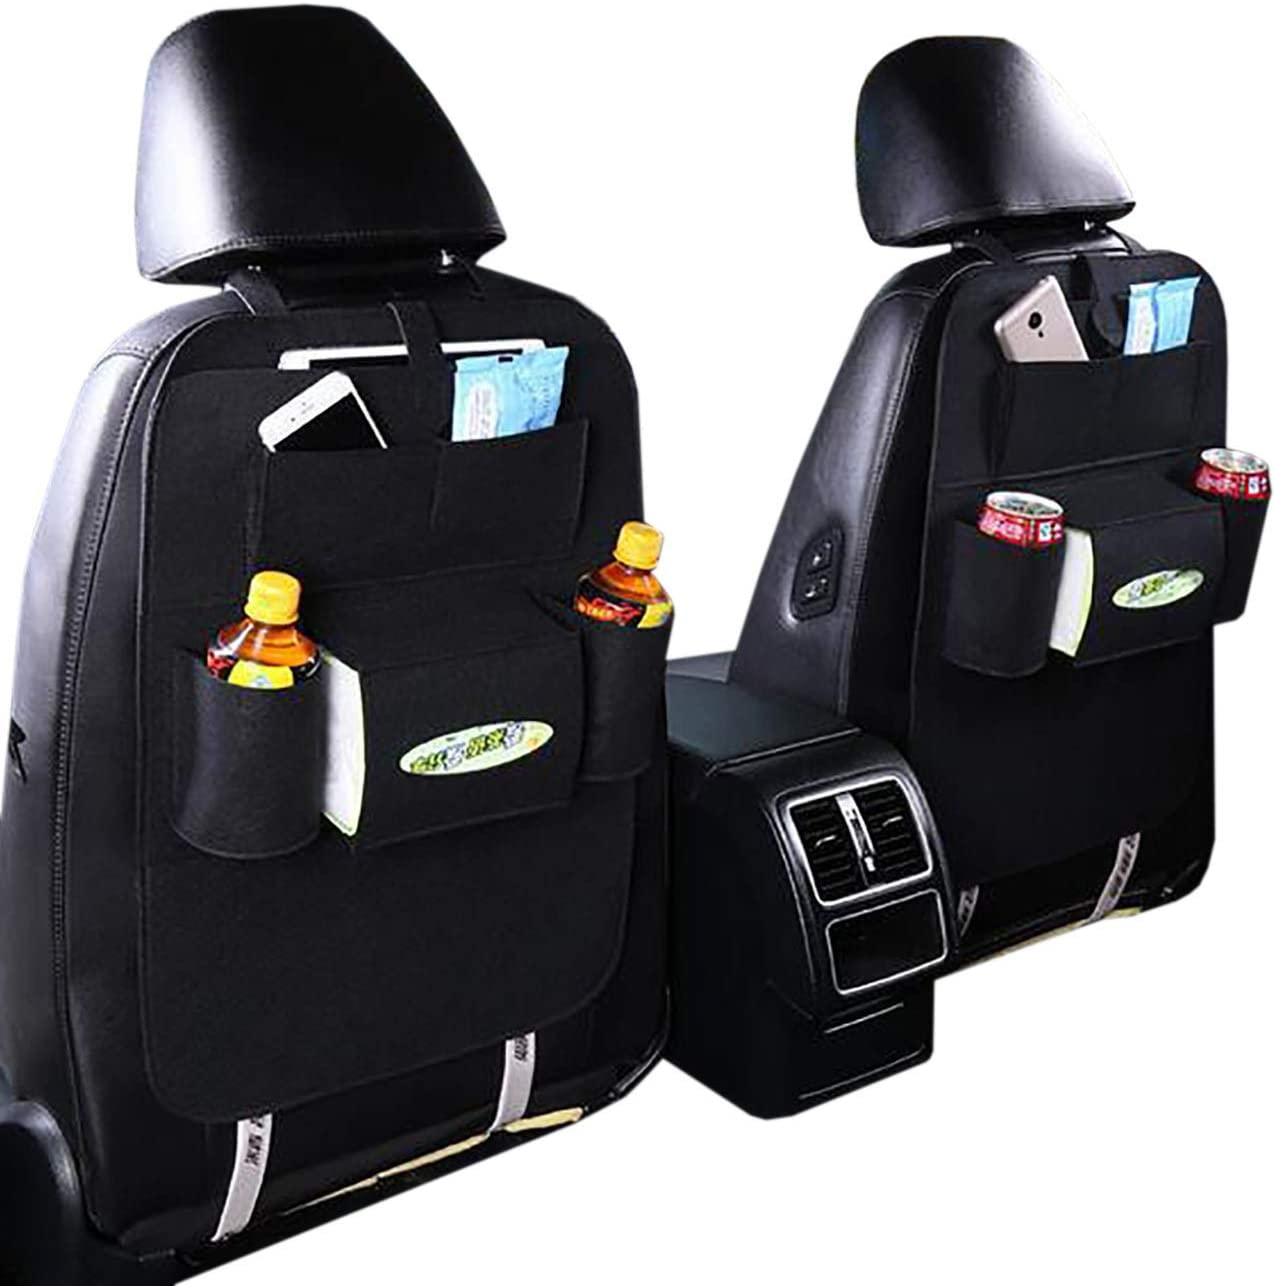 Uheng Car Back Seat Organizer, Backseat Organizer, Baby Kids Kick Mats Car Protector with 7 Multi Pocket Storage Bag Holder for iPad Tablet Bottle Drink Tissue Box Toys (2 Pack, Black)